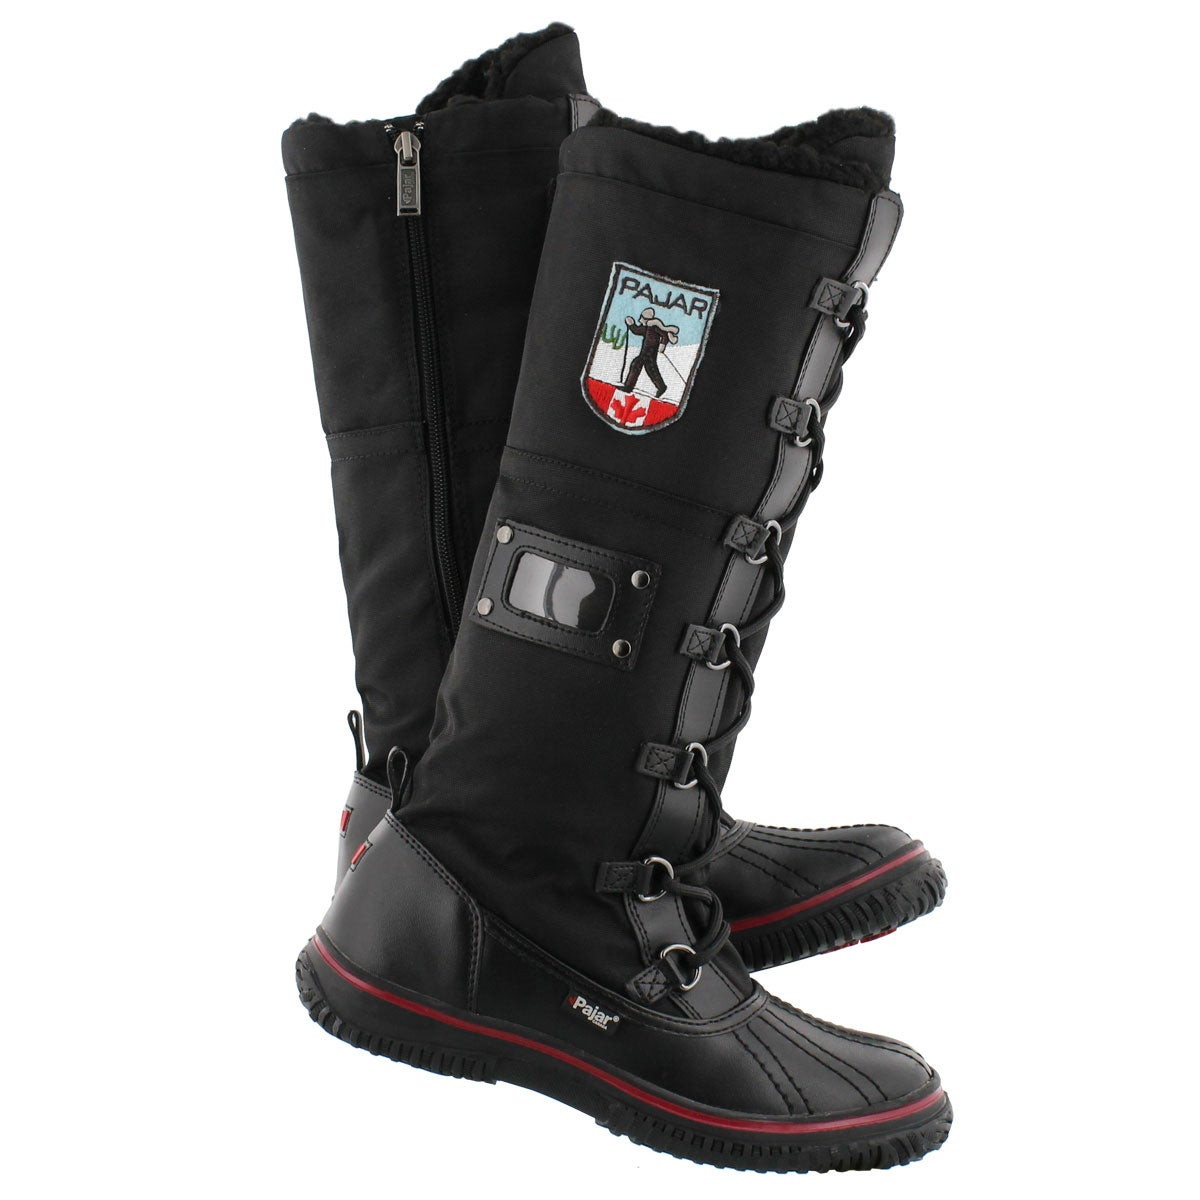 Lds Grip Zip blk nylon wtpf winter boot